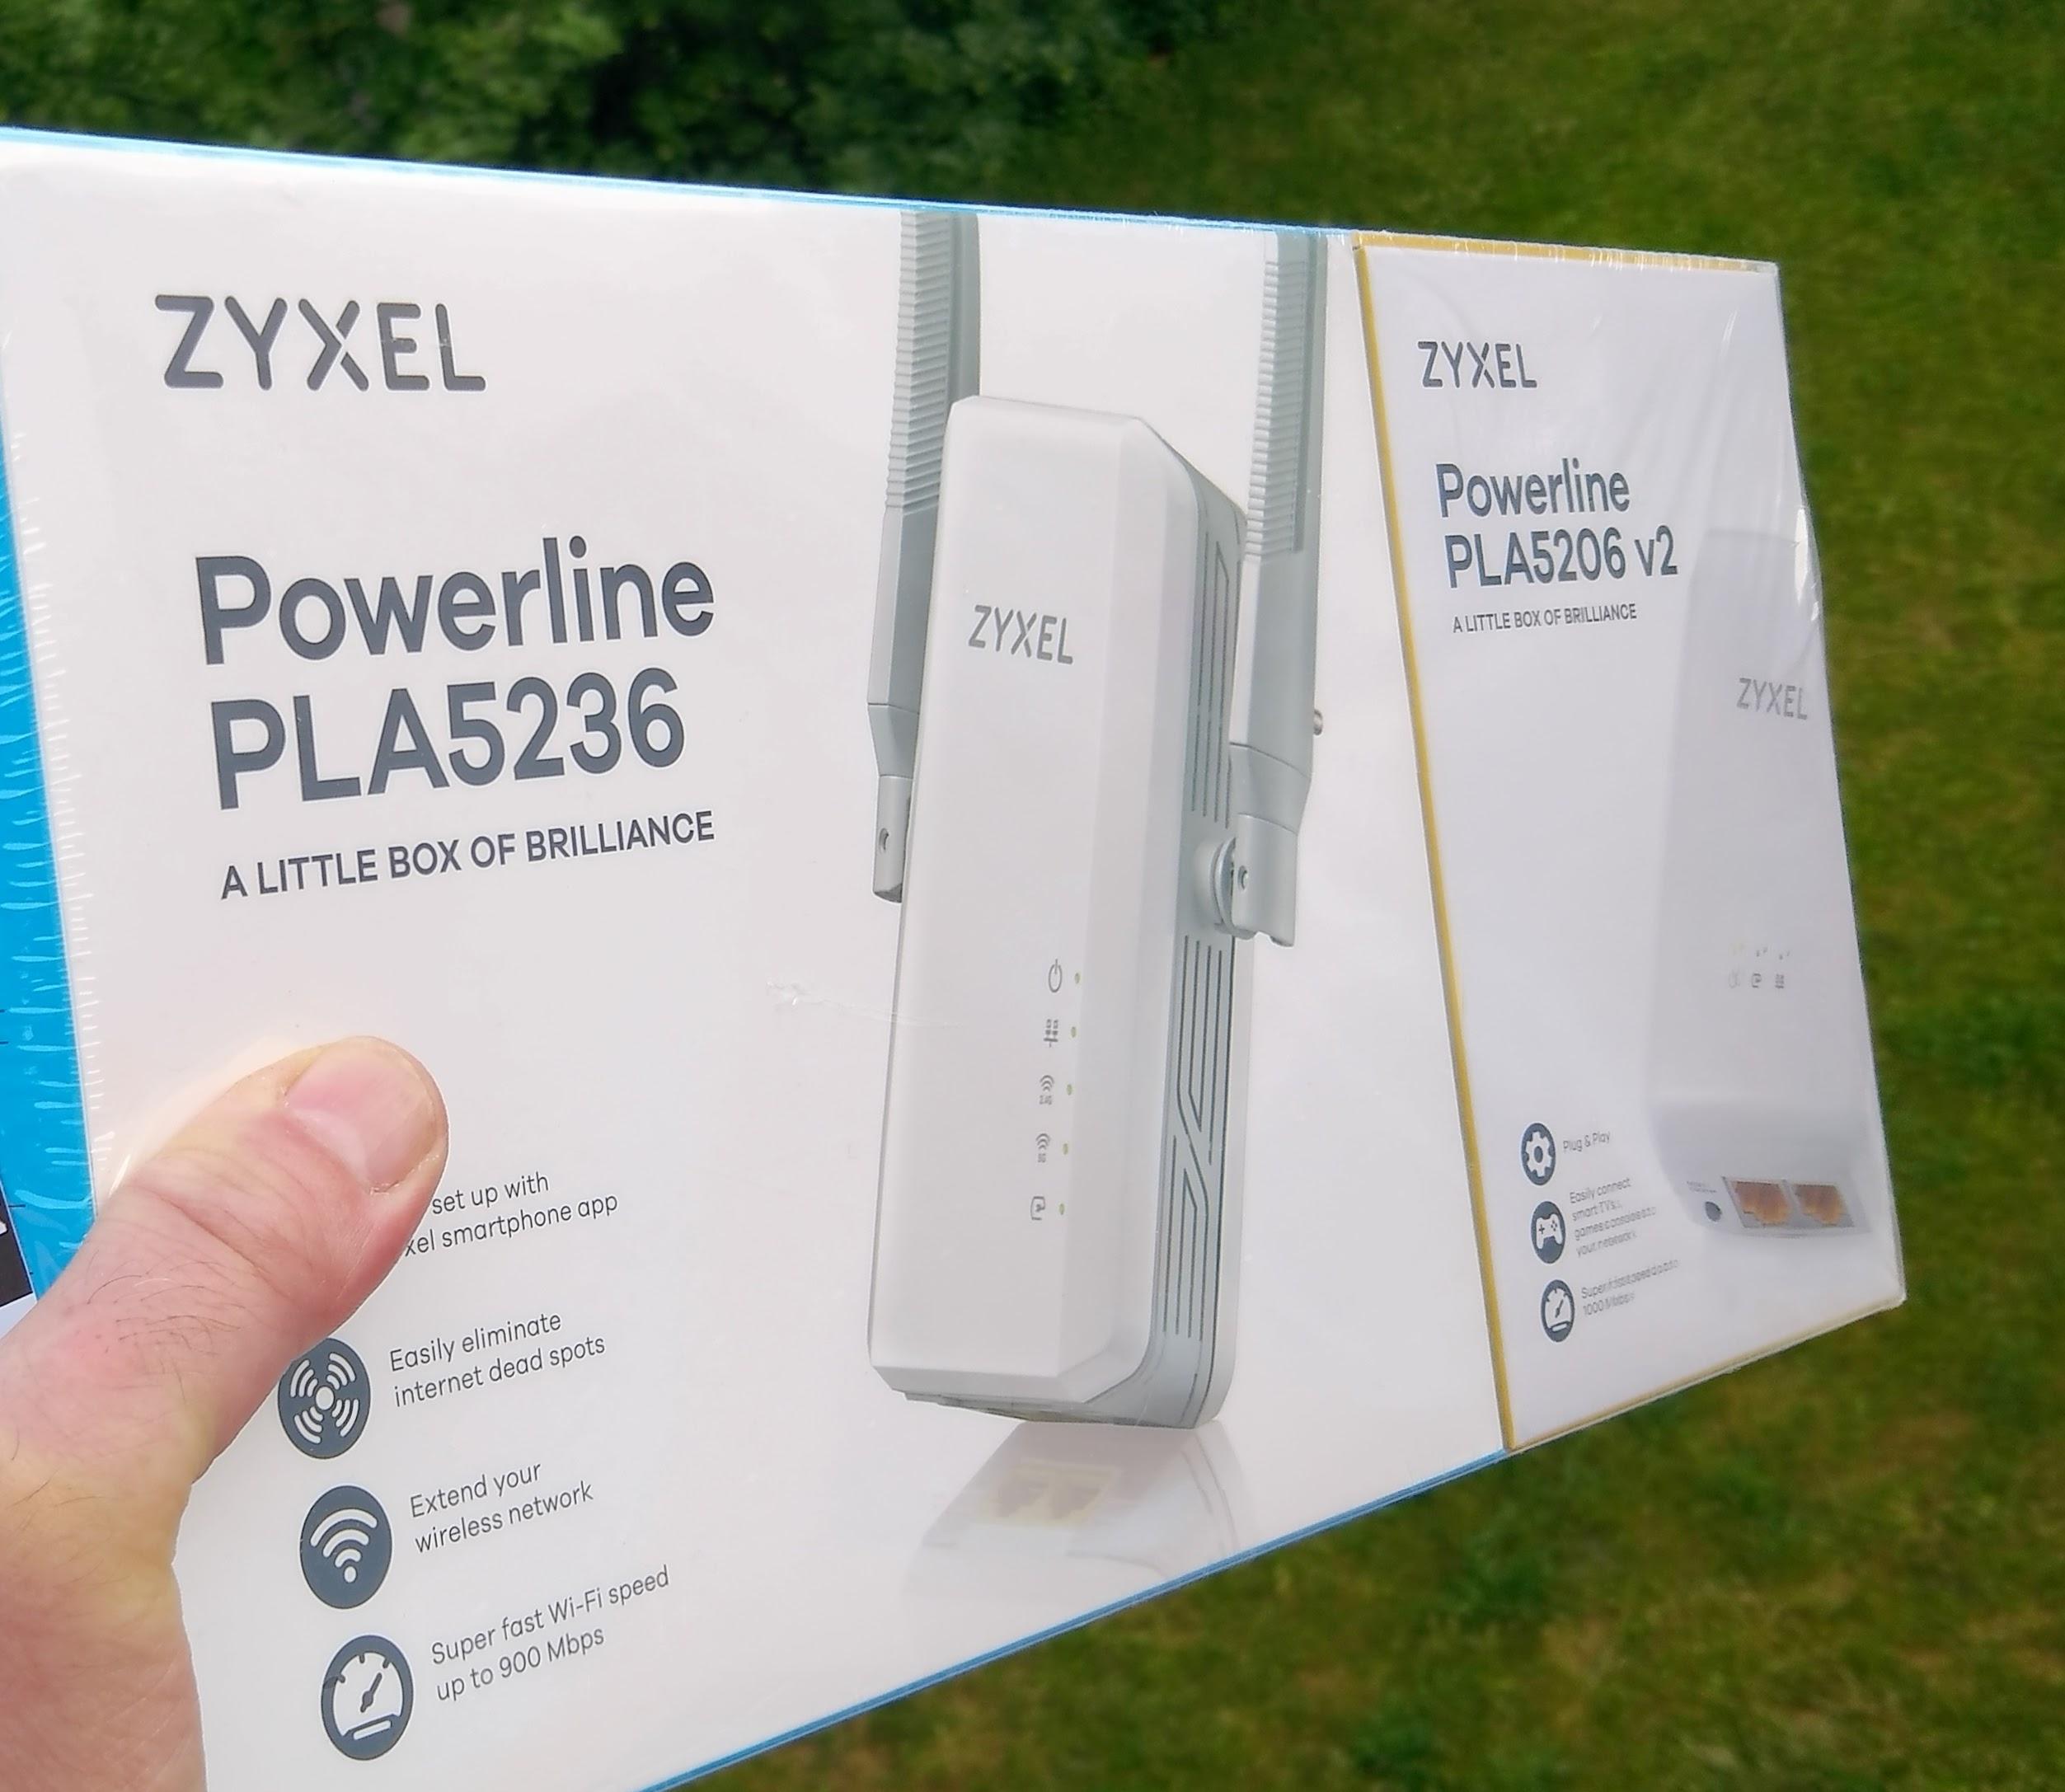 [Notebooksbilliger] Pseudo-Preisfehler: ZyXEL PLA5236, Powerline-Kit (1000 MBit/s) mit WLAN (ac, simultan) für 59,99 Euro